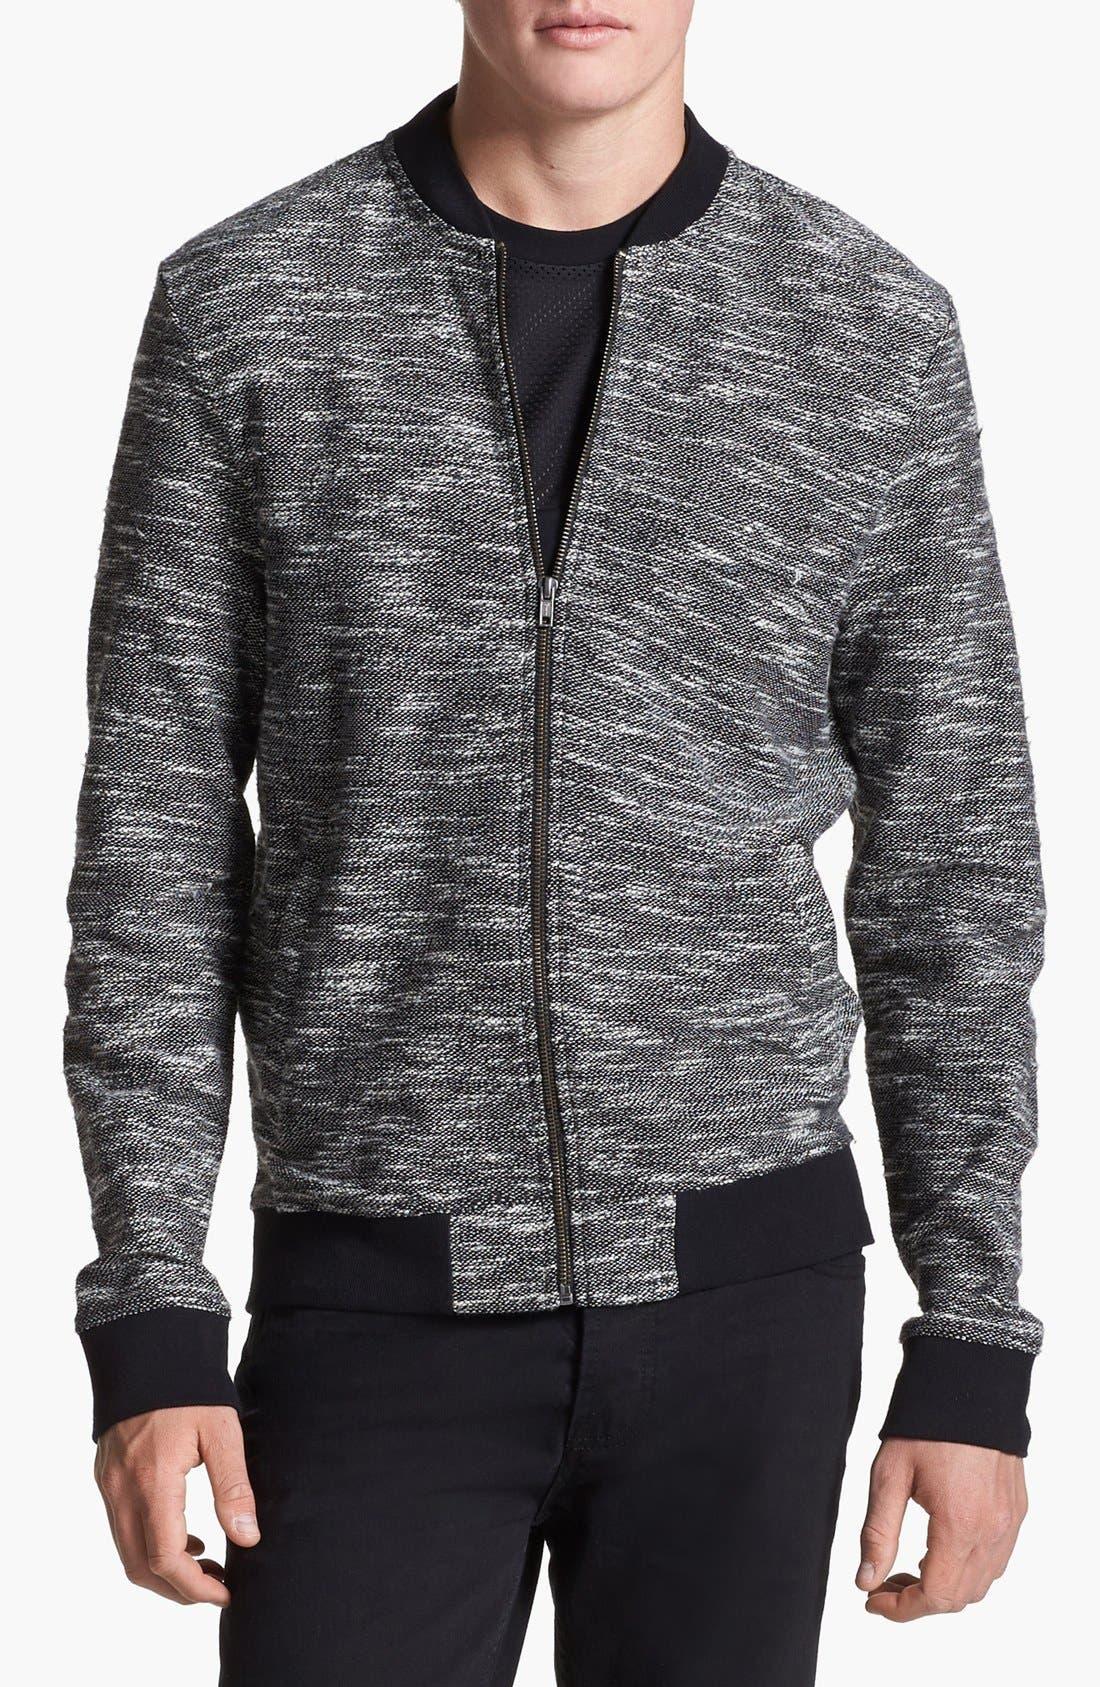 Alternate Image 1 Selected - Topman Knit Bomber Jacket